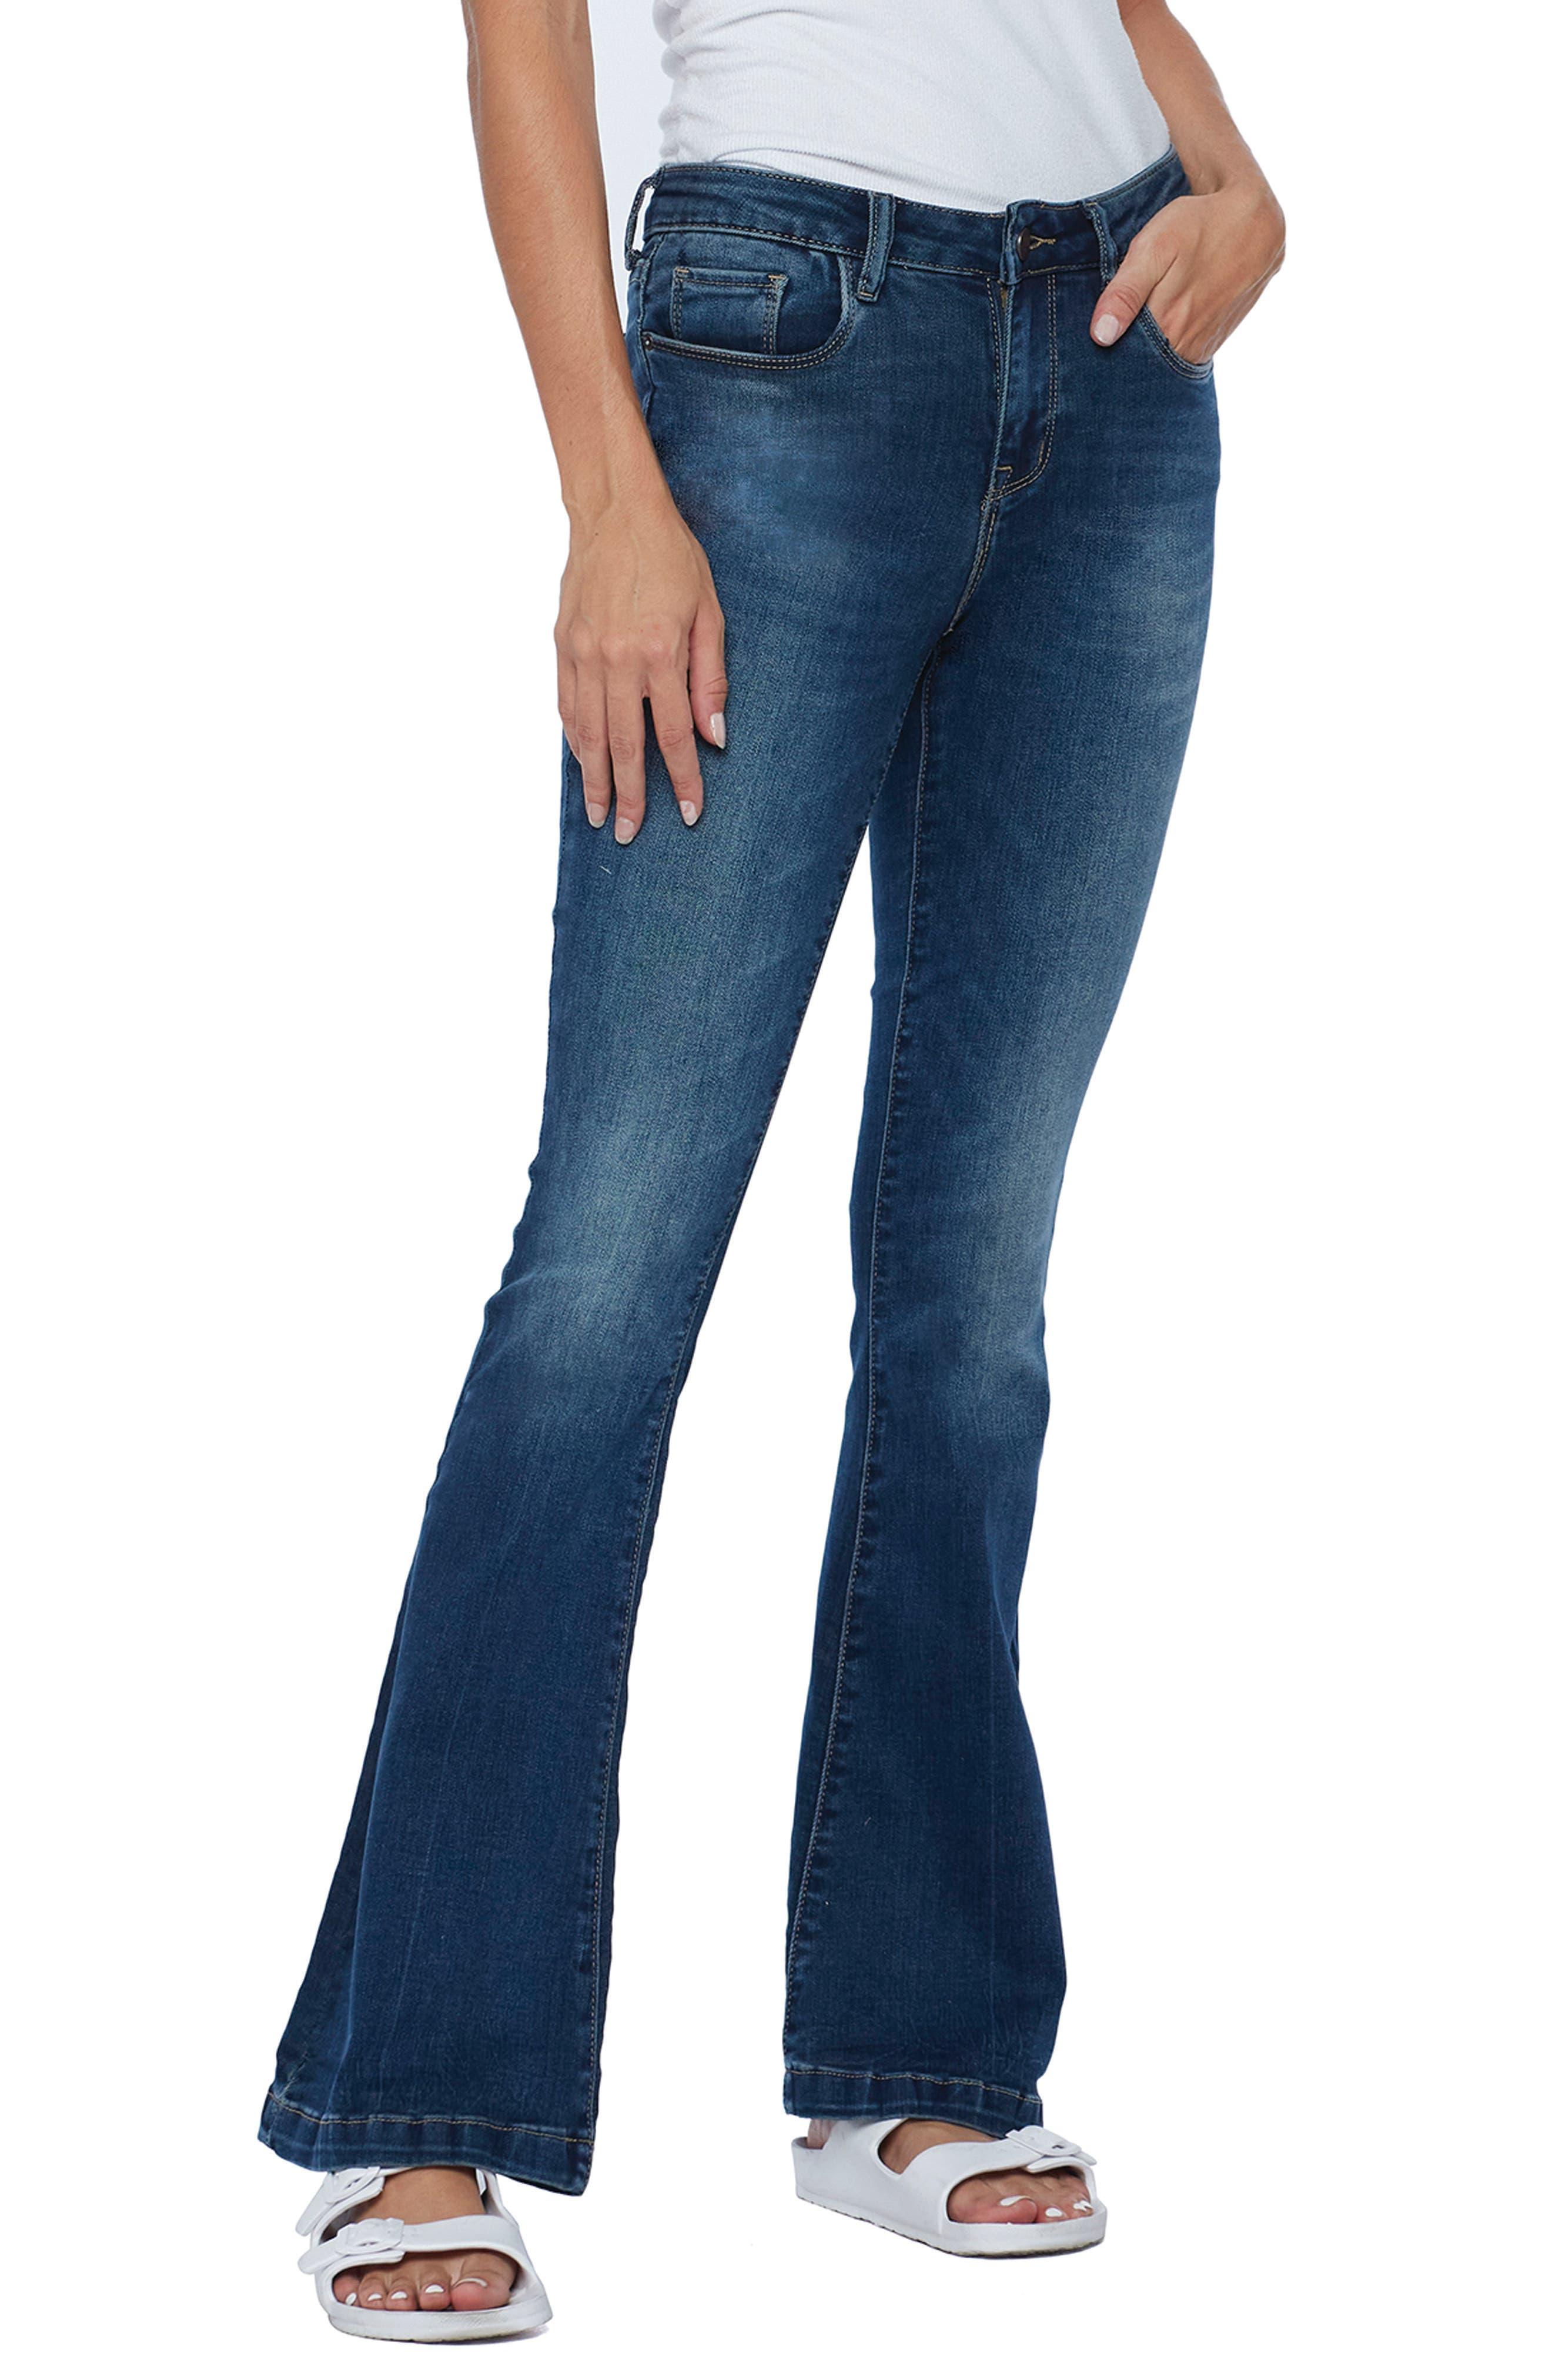 Fun Flare Jeans